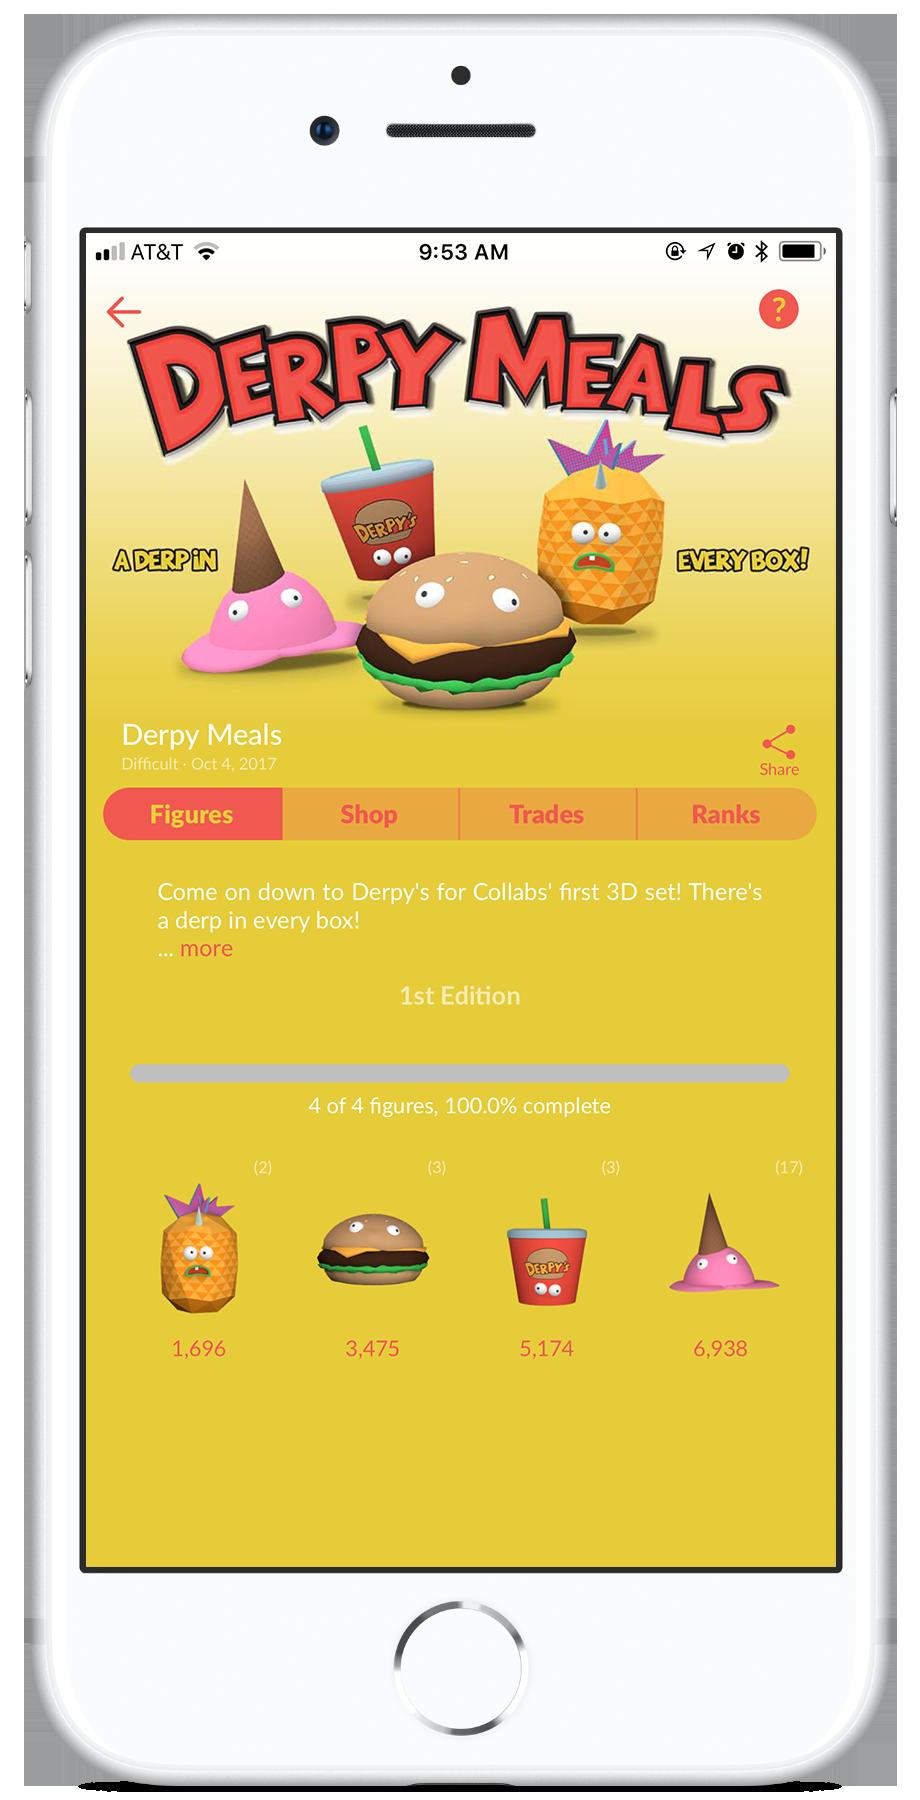 Derpy-Meals_iPhone8.png